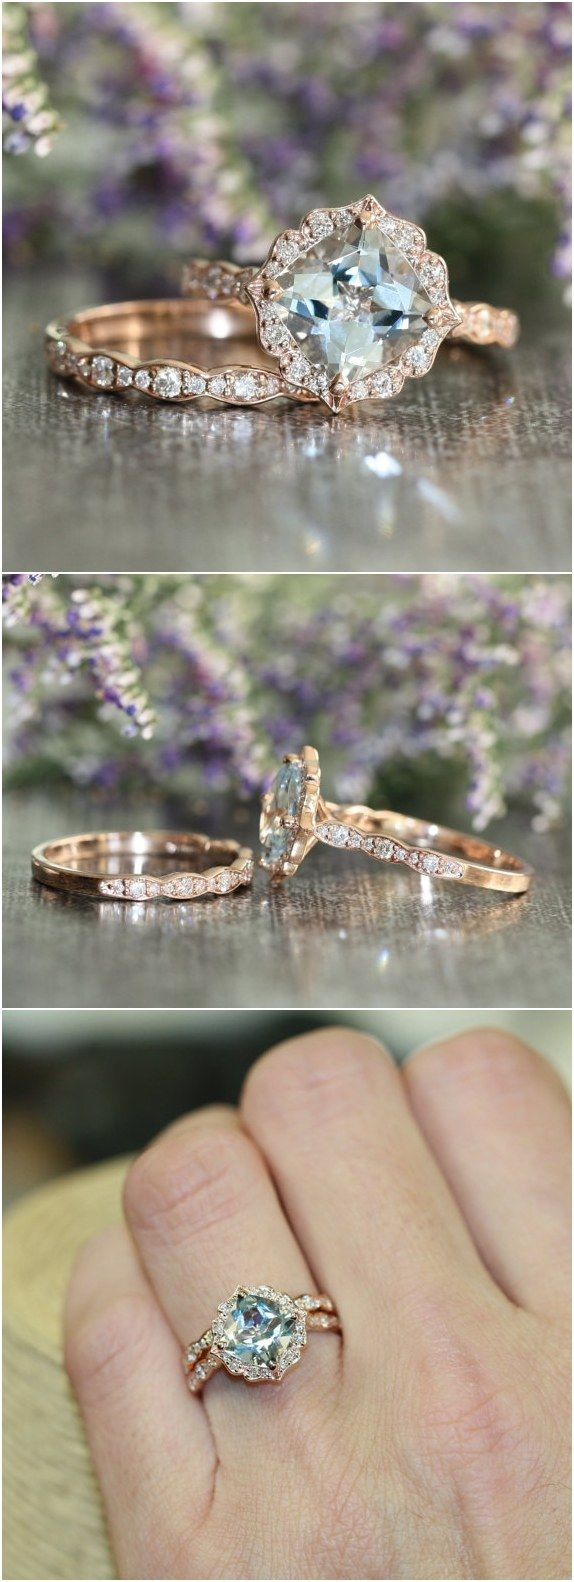 Trend We Love: 20 Floralinspired Engagement Rings Aquamarine Engagement